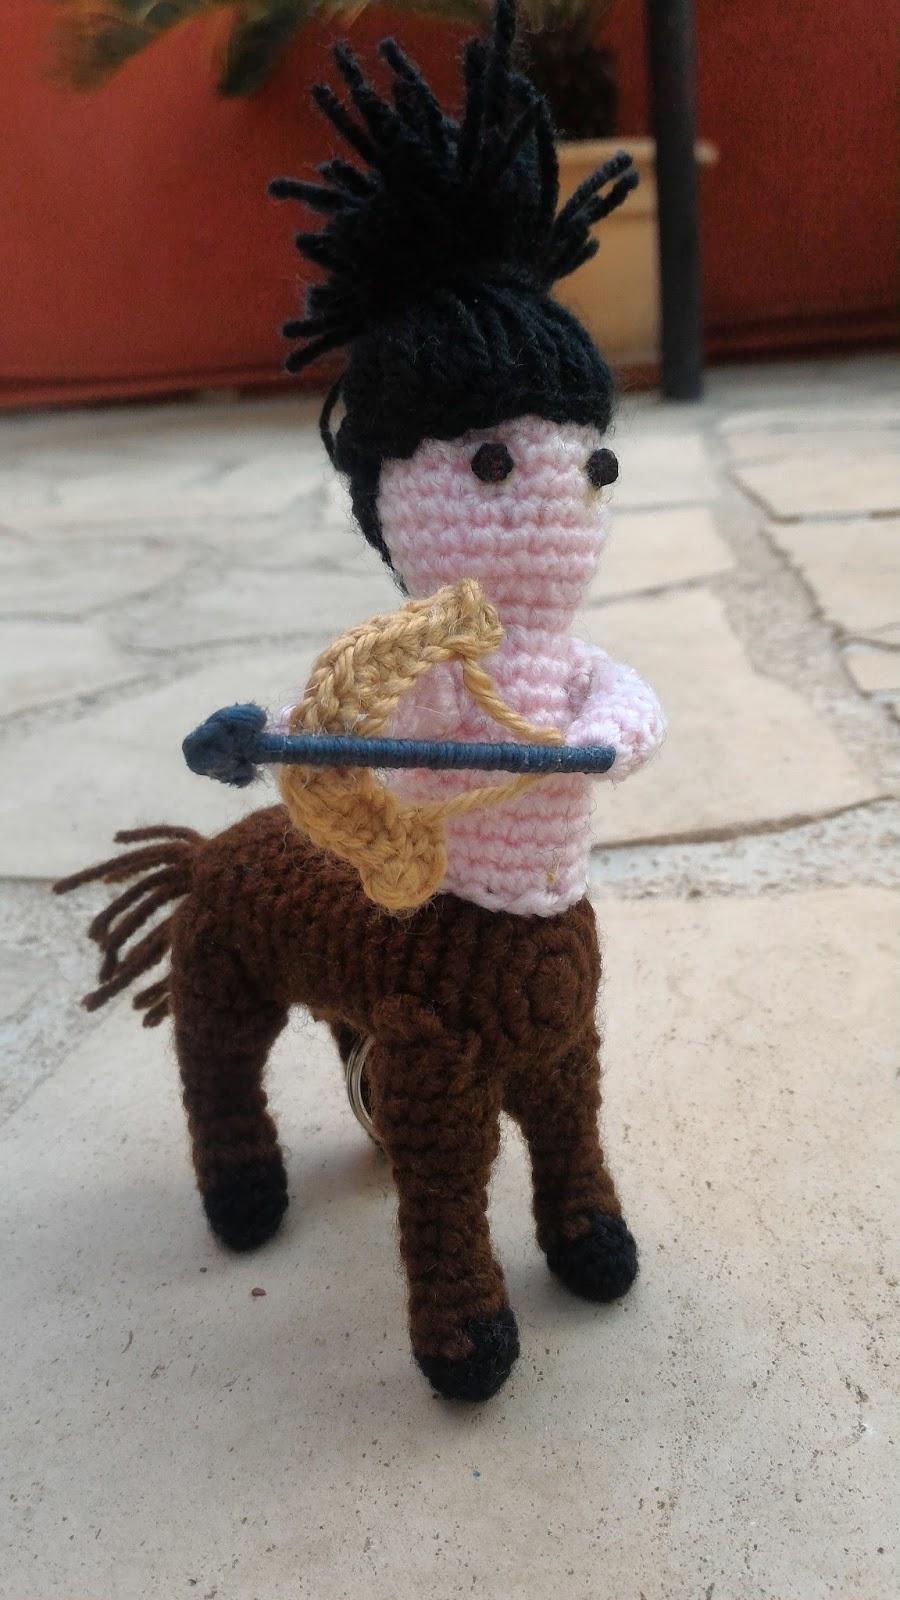 Donkey amigurumi crochet pattern #Amigurumi #Crochet #donkey ... | 1600x900